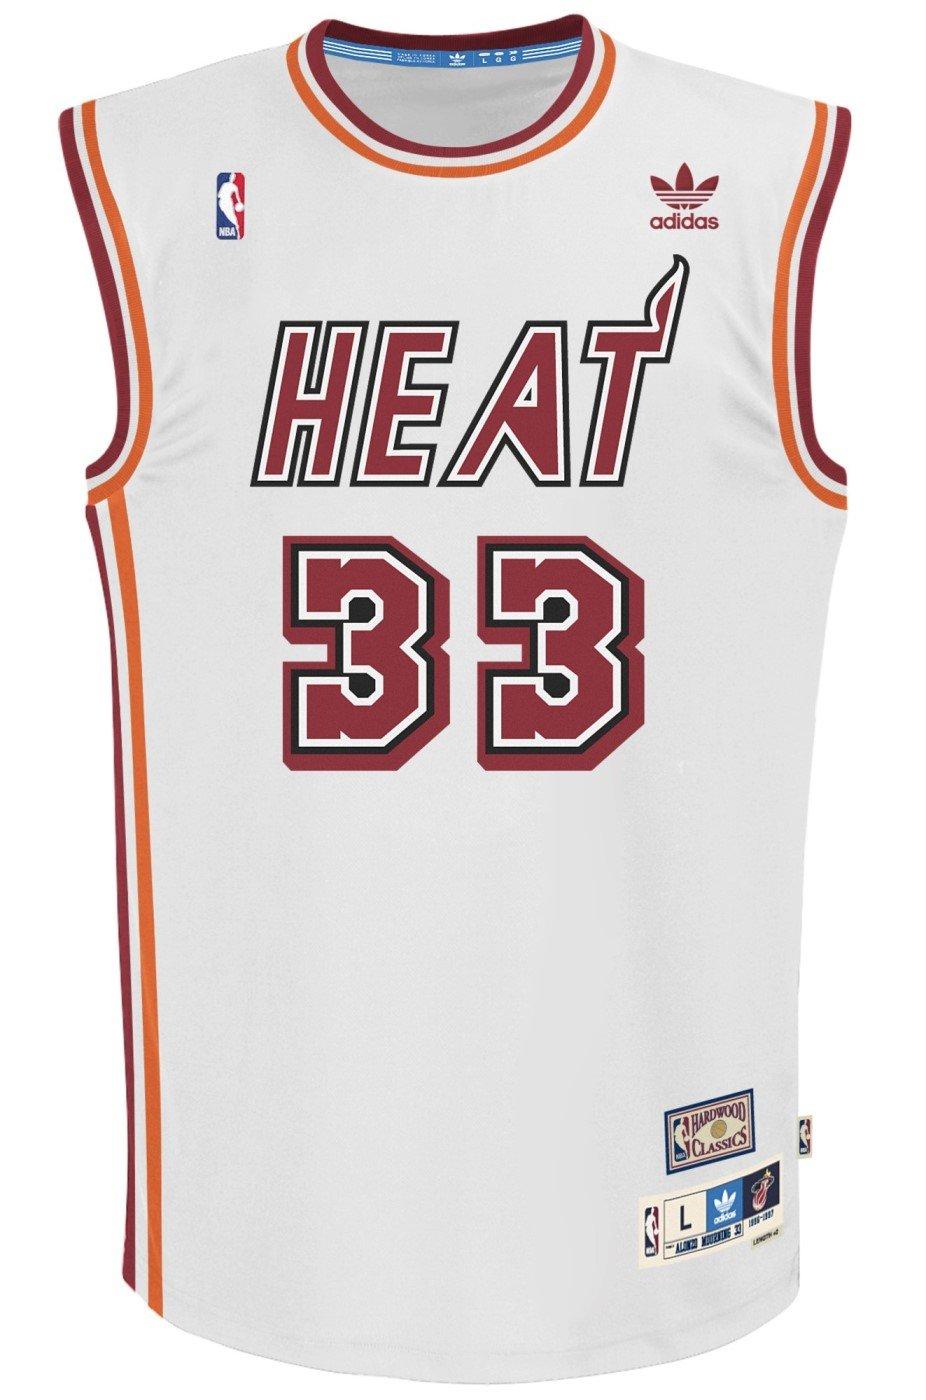 Alonzo Mourning Miami Heat Adidas NBA Throwback Swingman Jersey - White   Amazon.co.uk  Sports   Outdoors 530526543